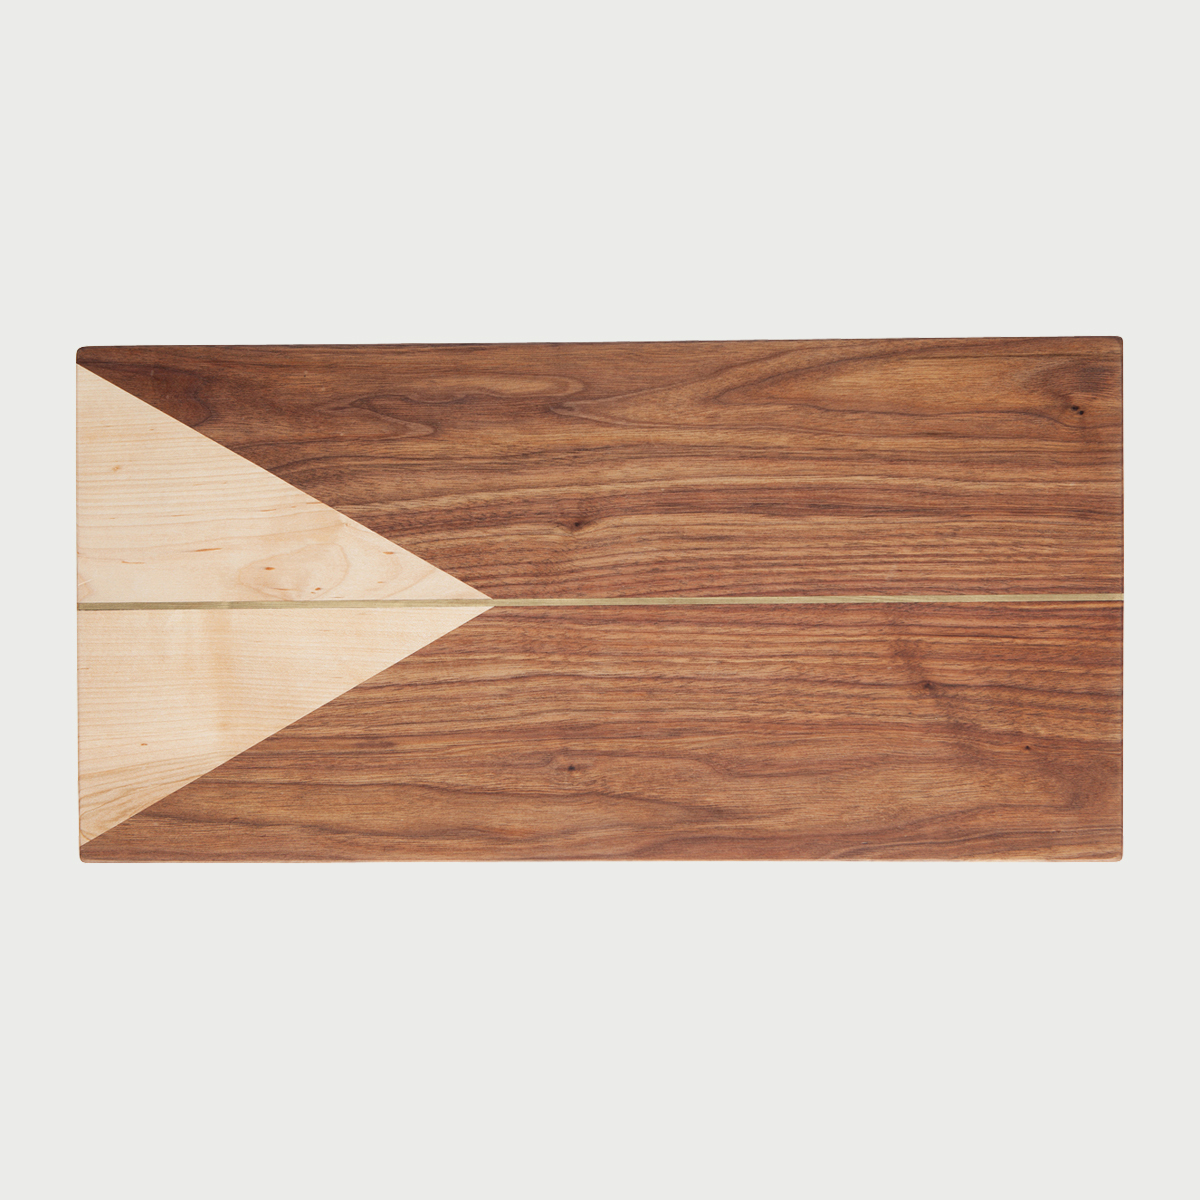 Chris earl rectangle cheeseboard